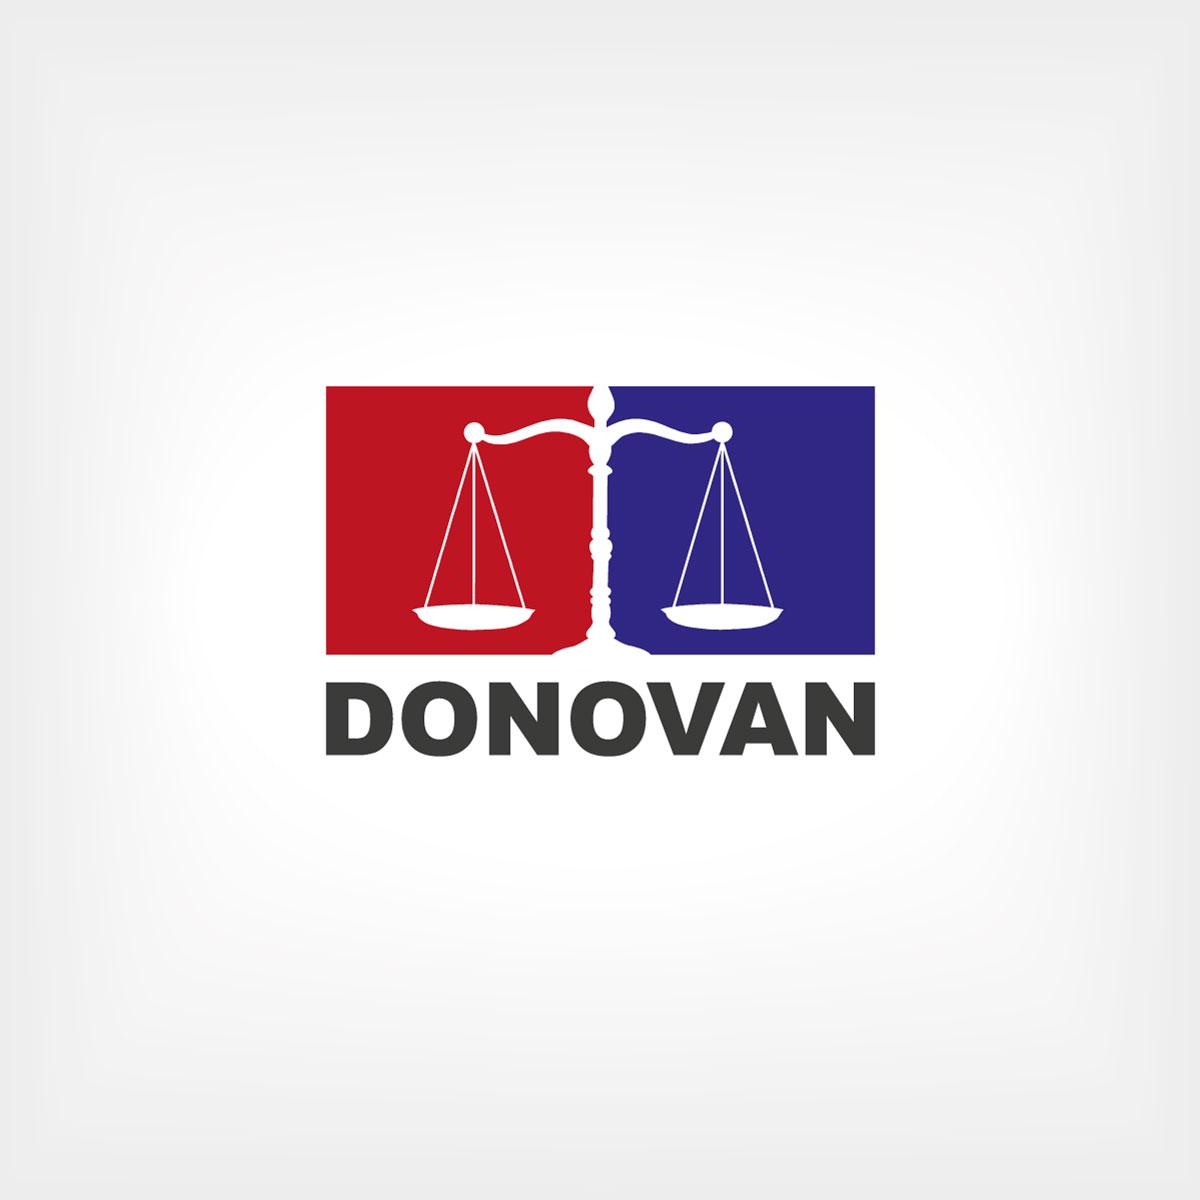 Creación de logotipo para un bufete de abogados en EEUU